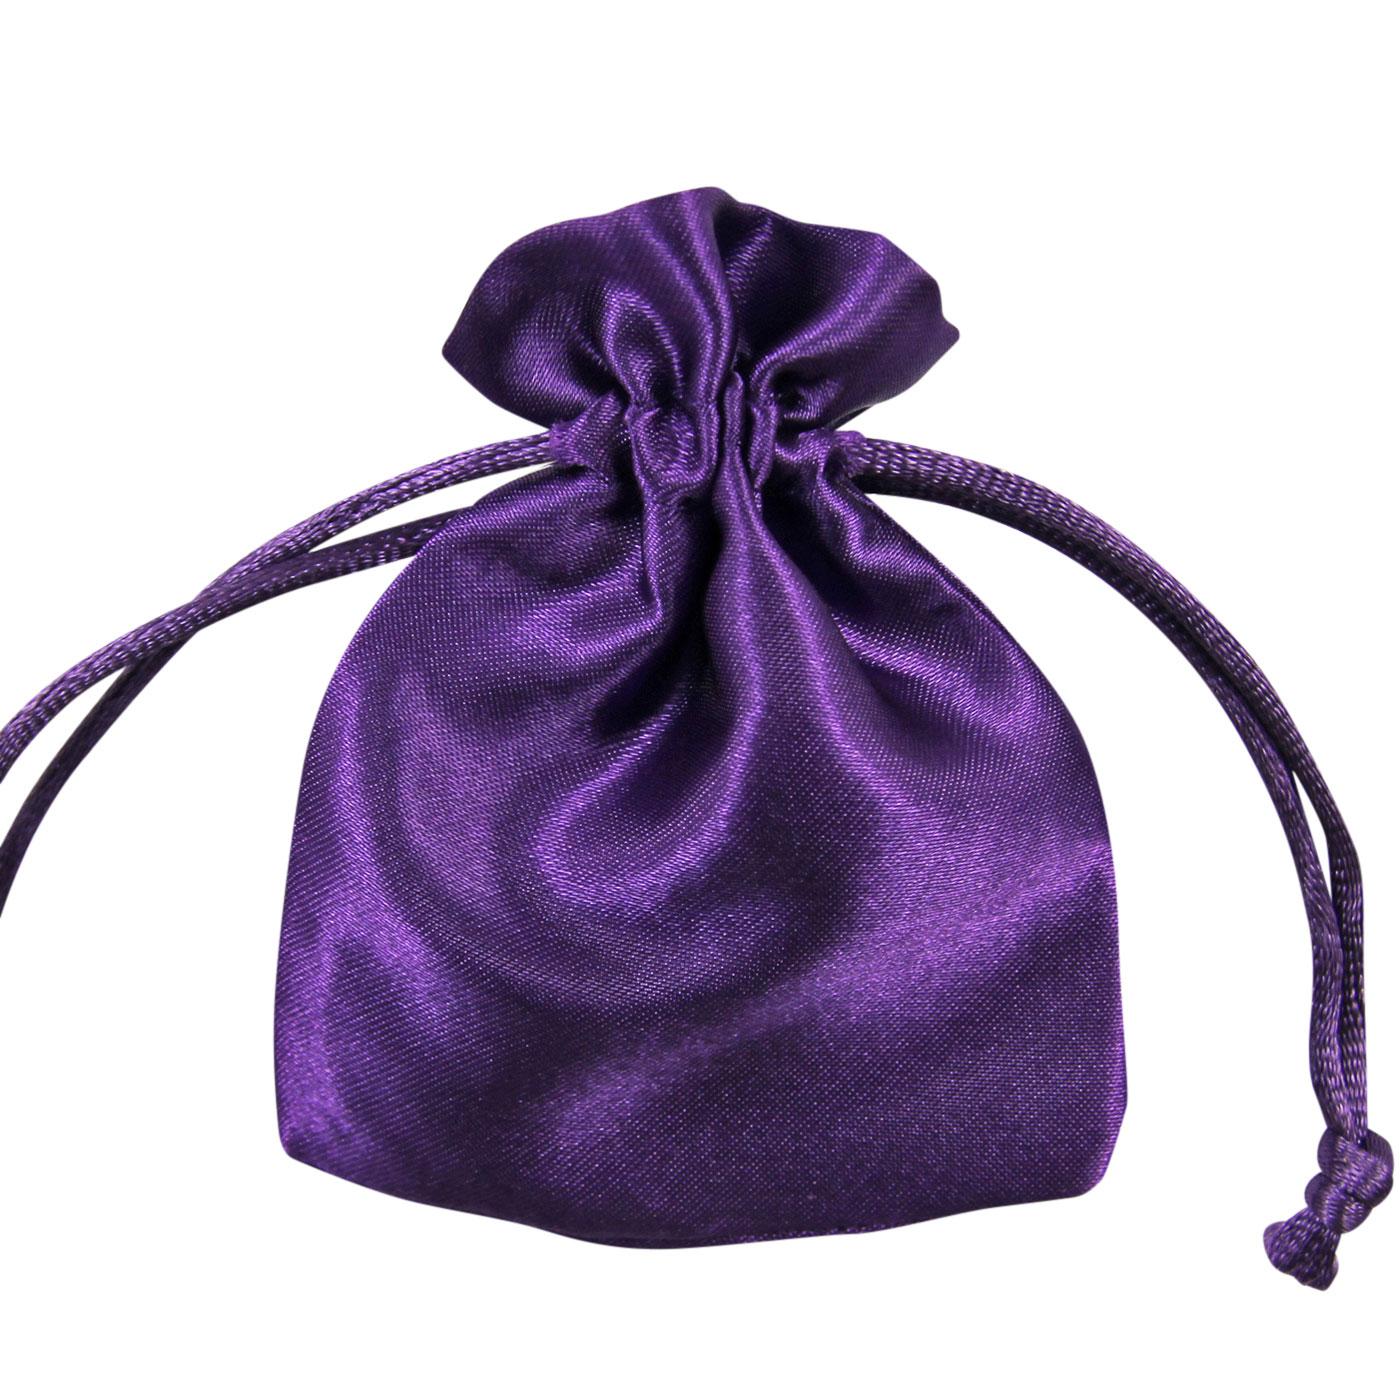 SATIN Jewellery Drawstring Gift Bag POUCHES - 5 COLOURS, 3 SIZES